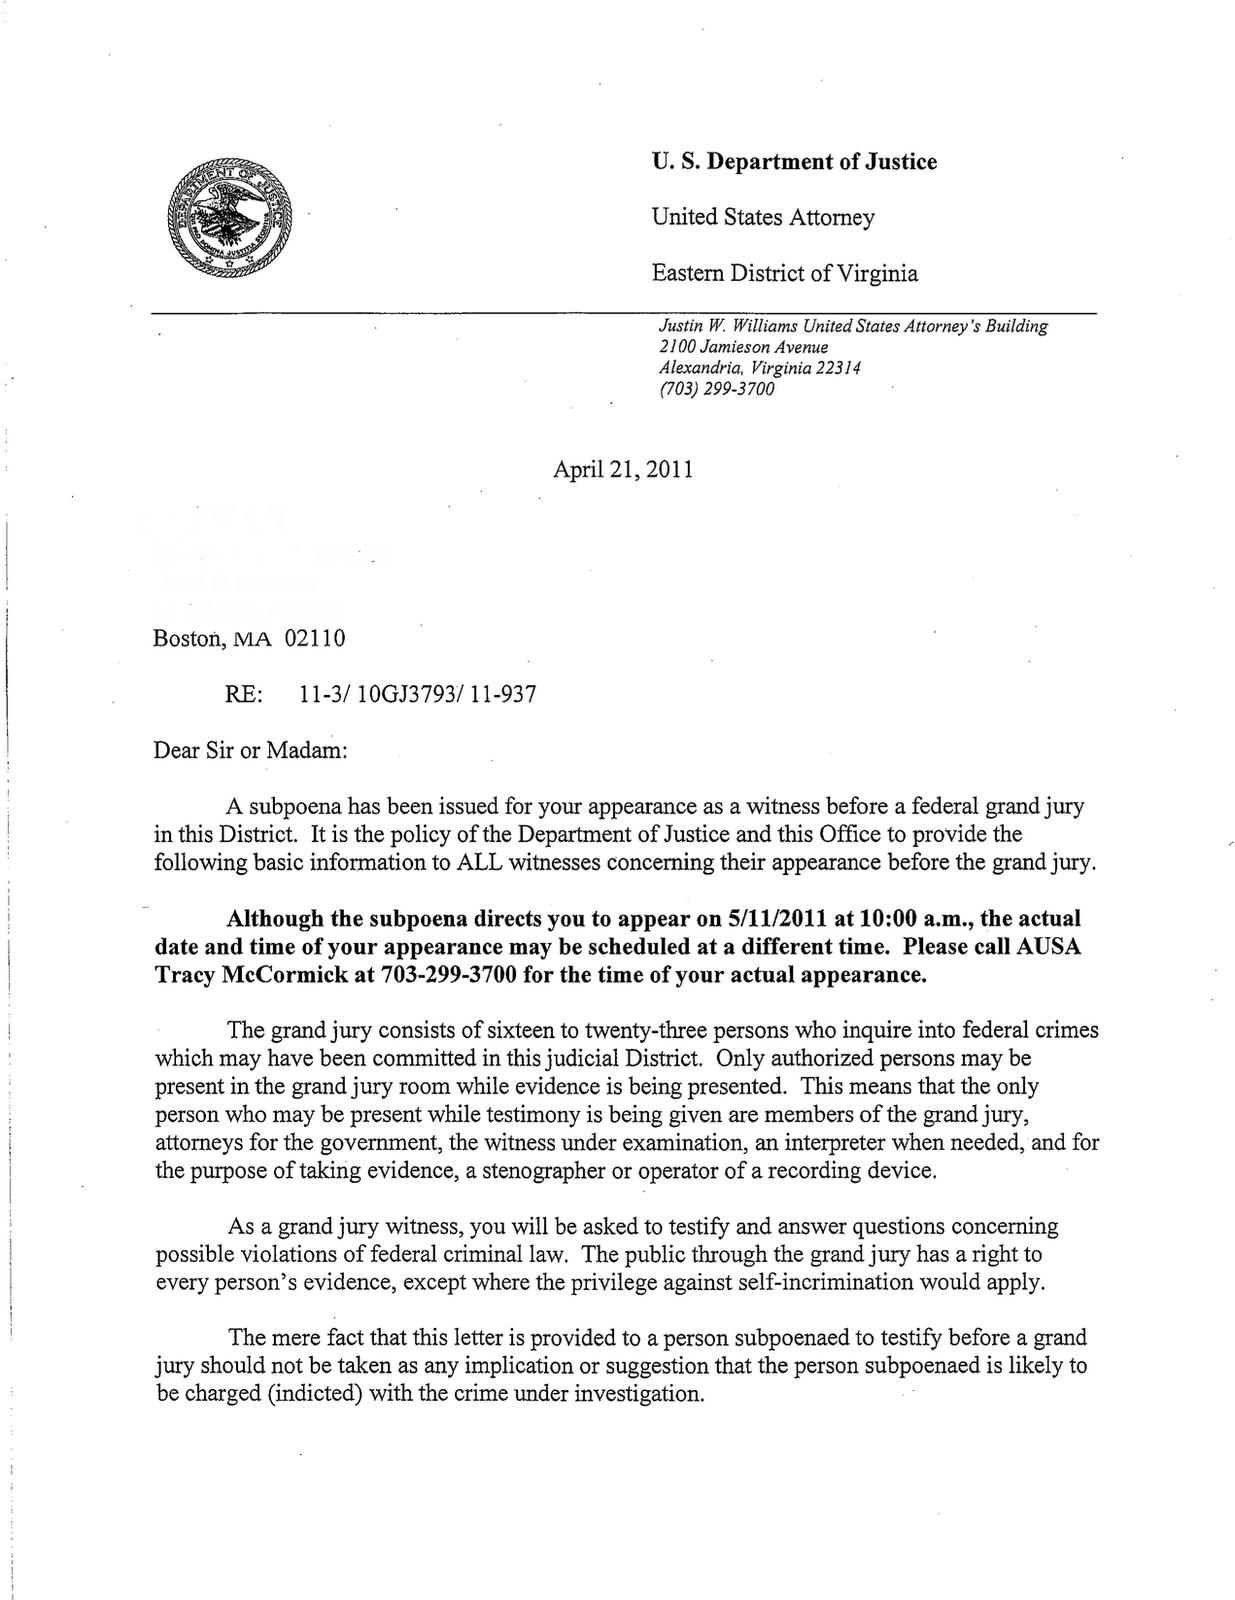 Fbi Serves Grand Jury Subpoena Likely Relating To Wikileaks